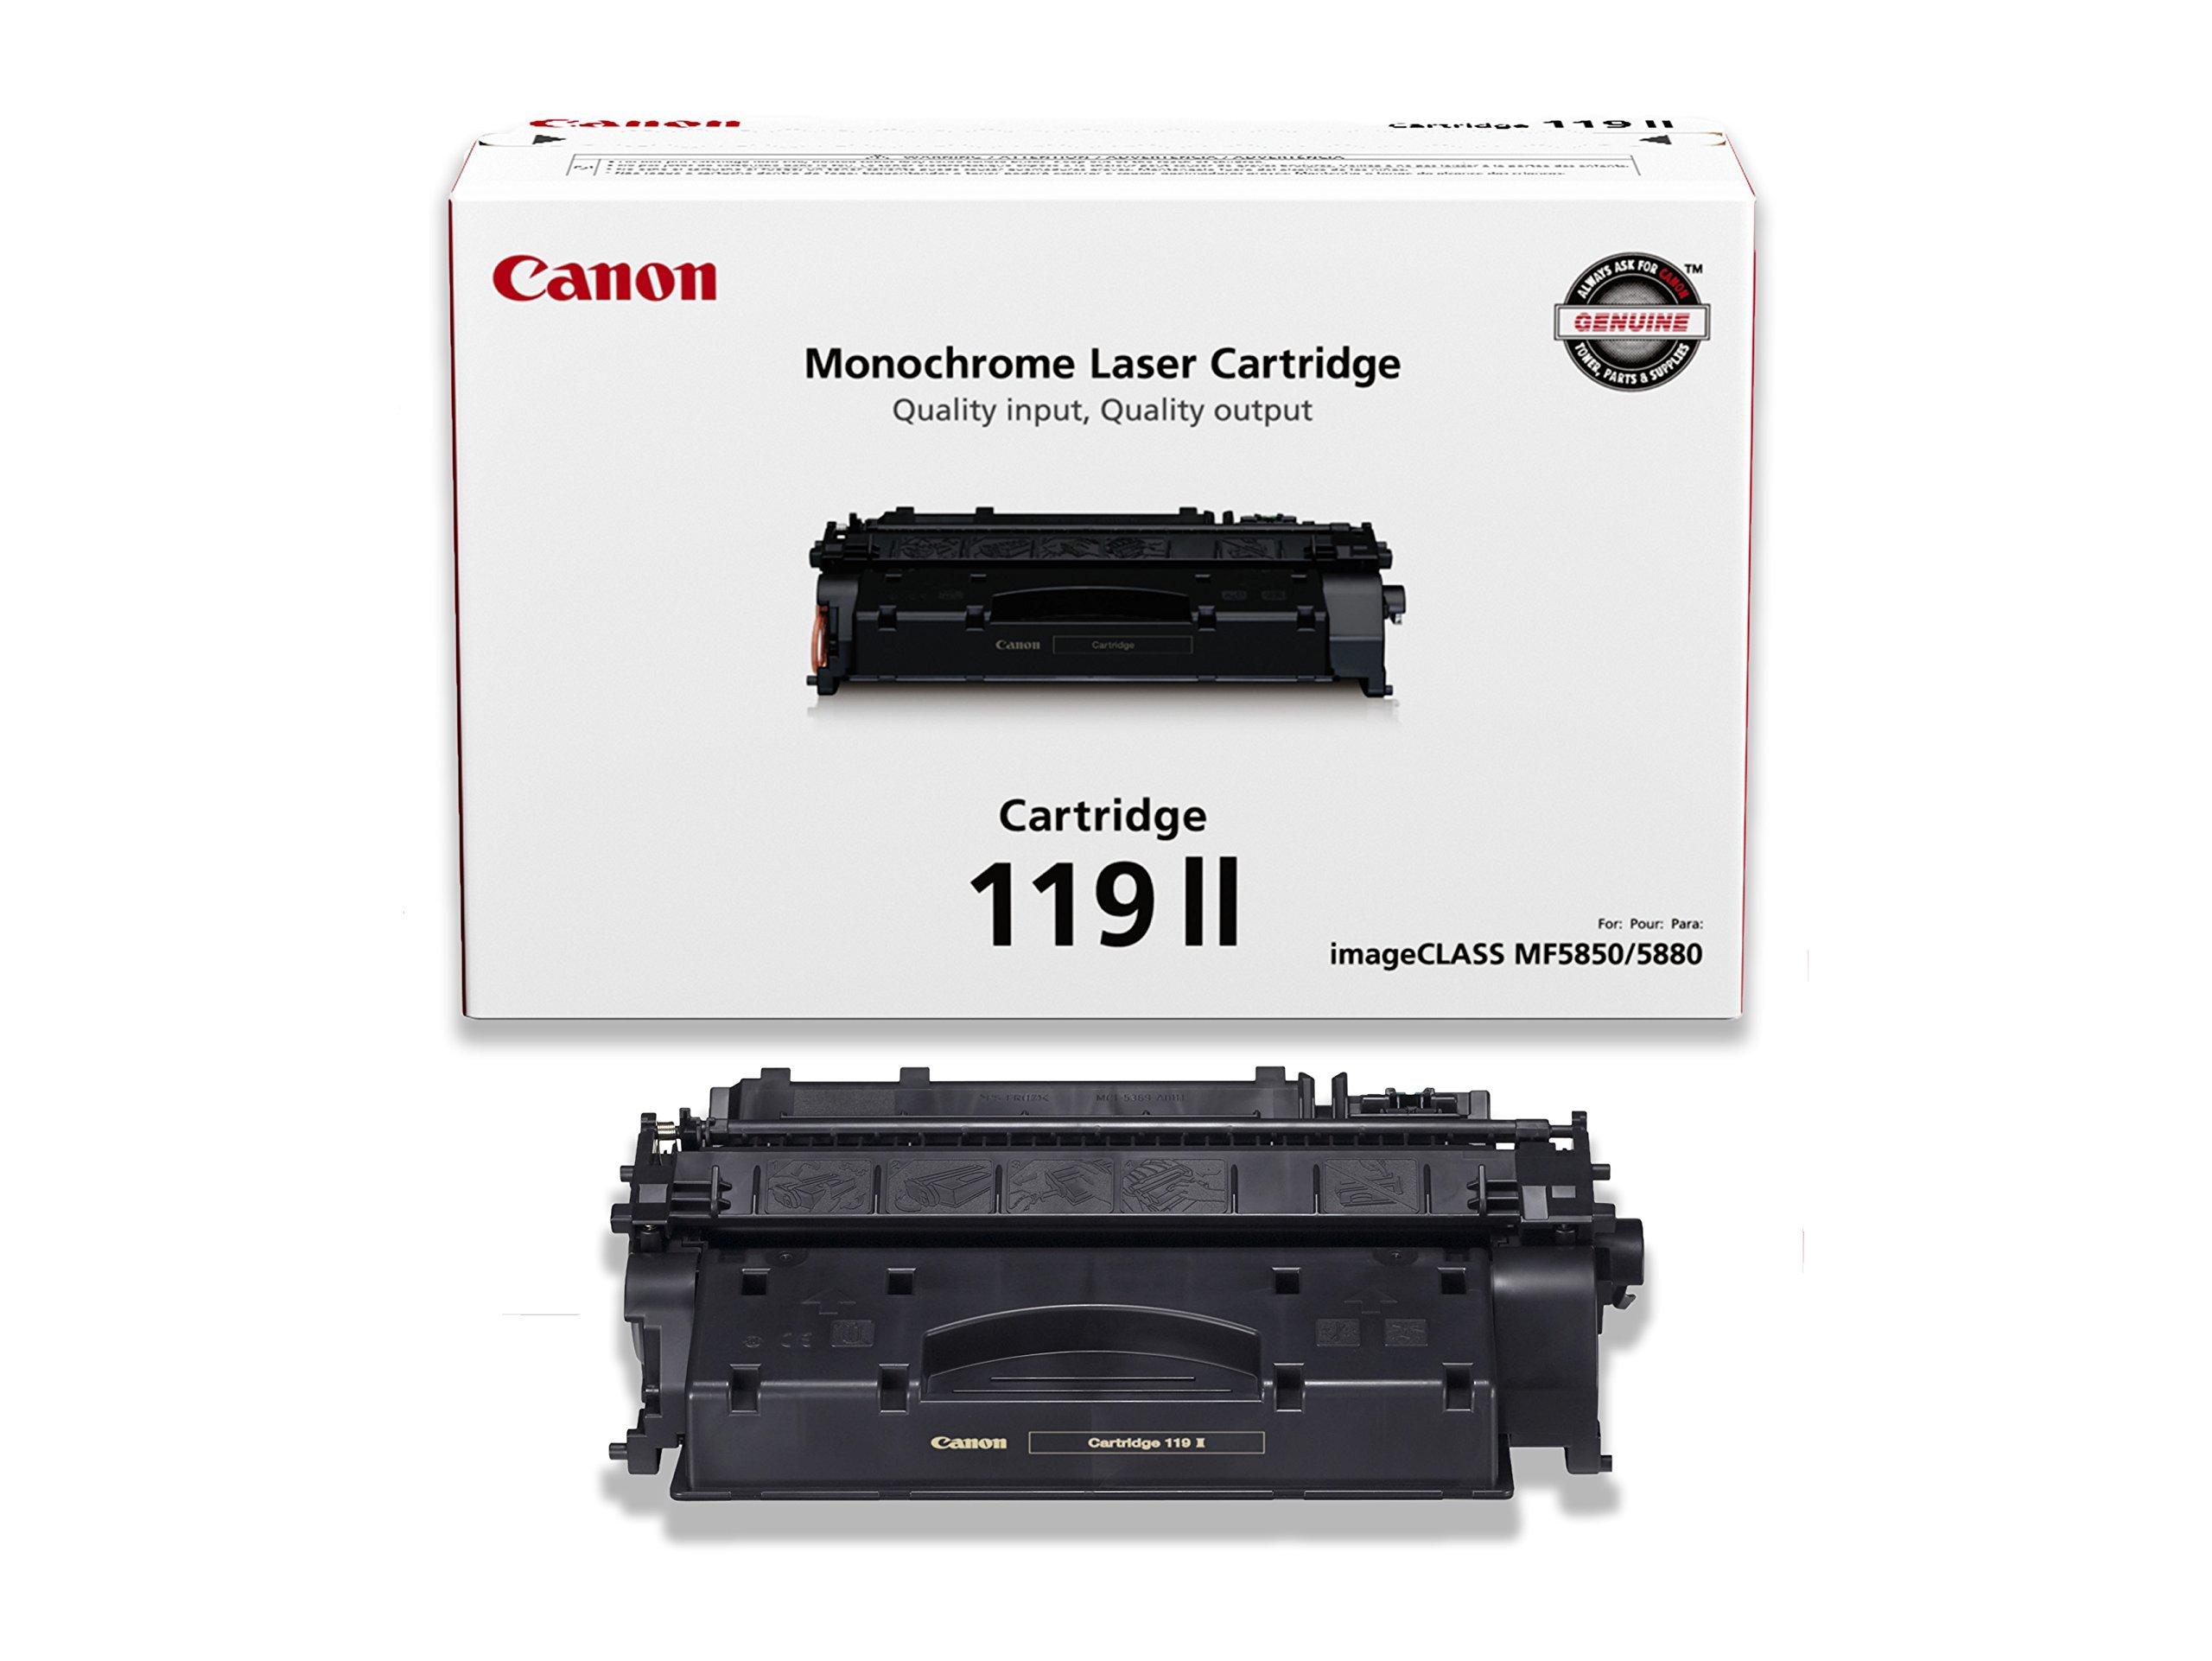 Canon Original 119 II High Capacity Toner Cartridge - Black